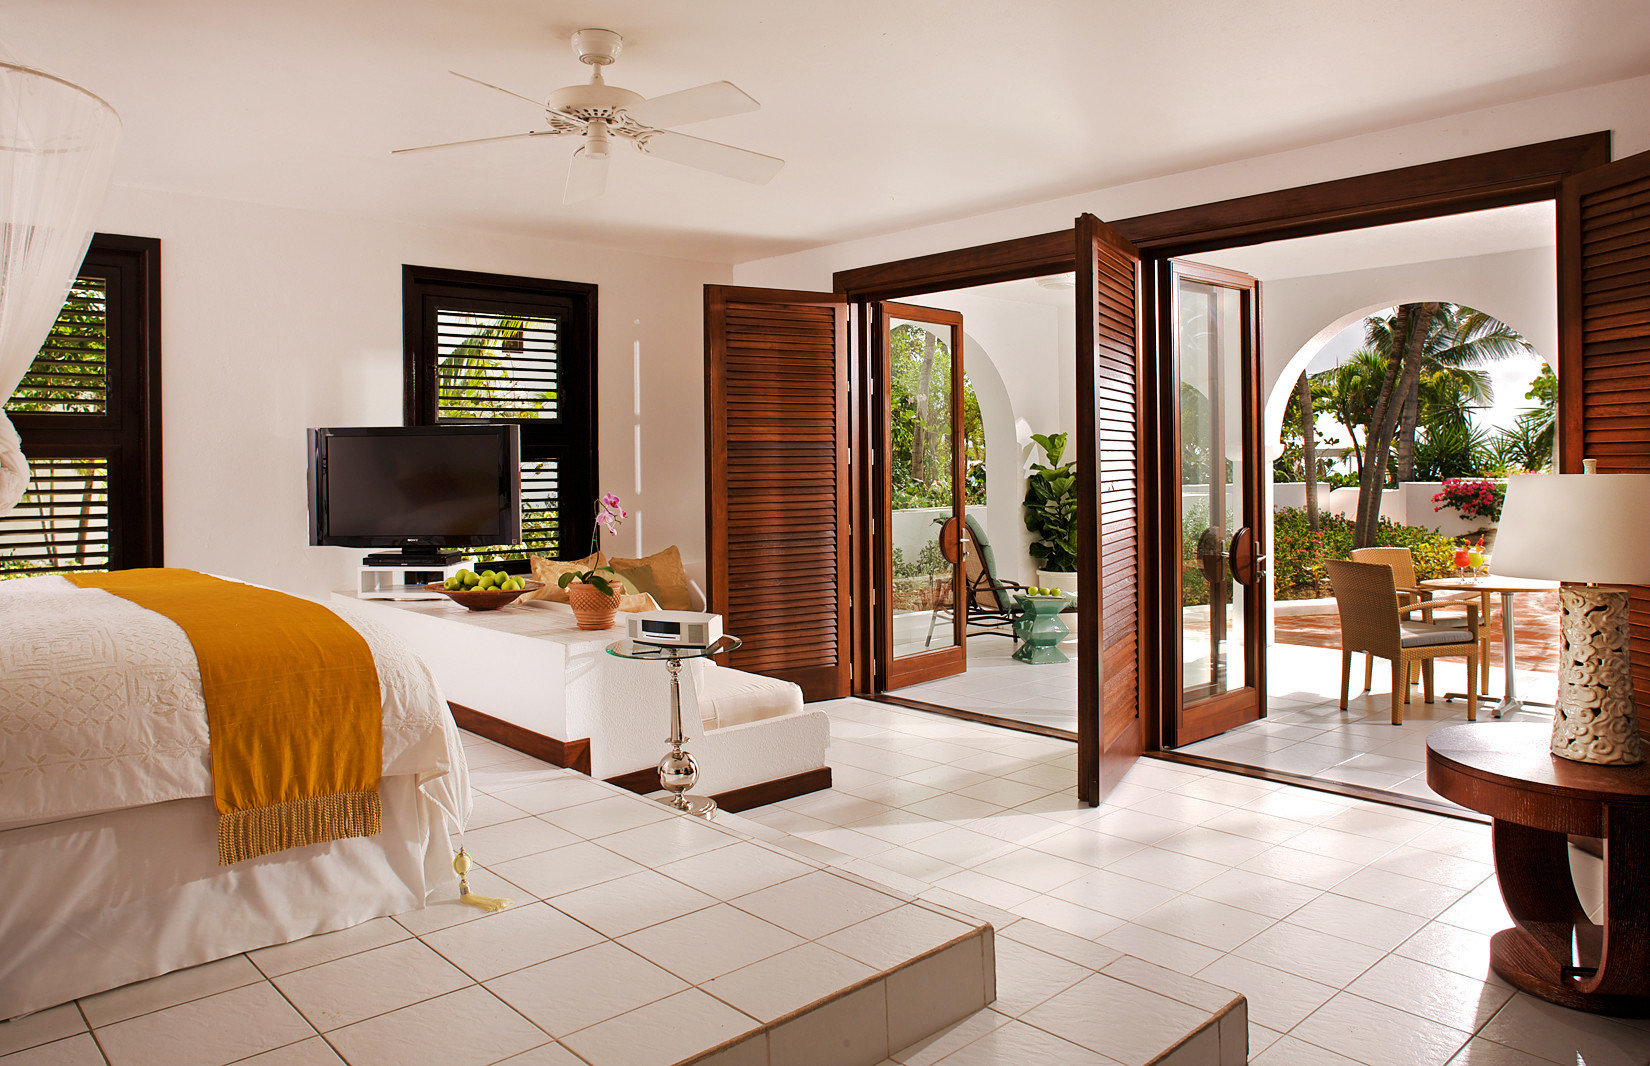 Beachfront Bedroom Luxury Scenic views Suite property living room home hardwood Villa condominium wood flooring cottage flooring